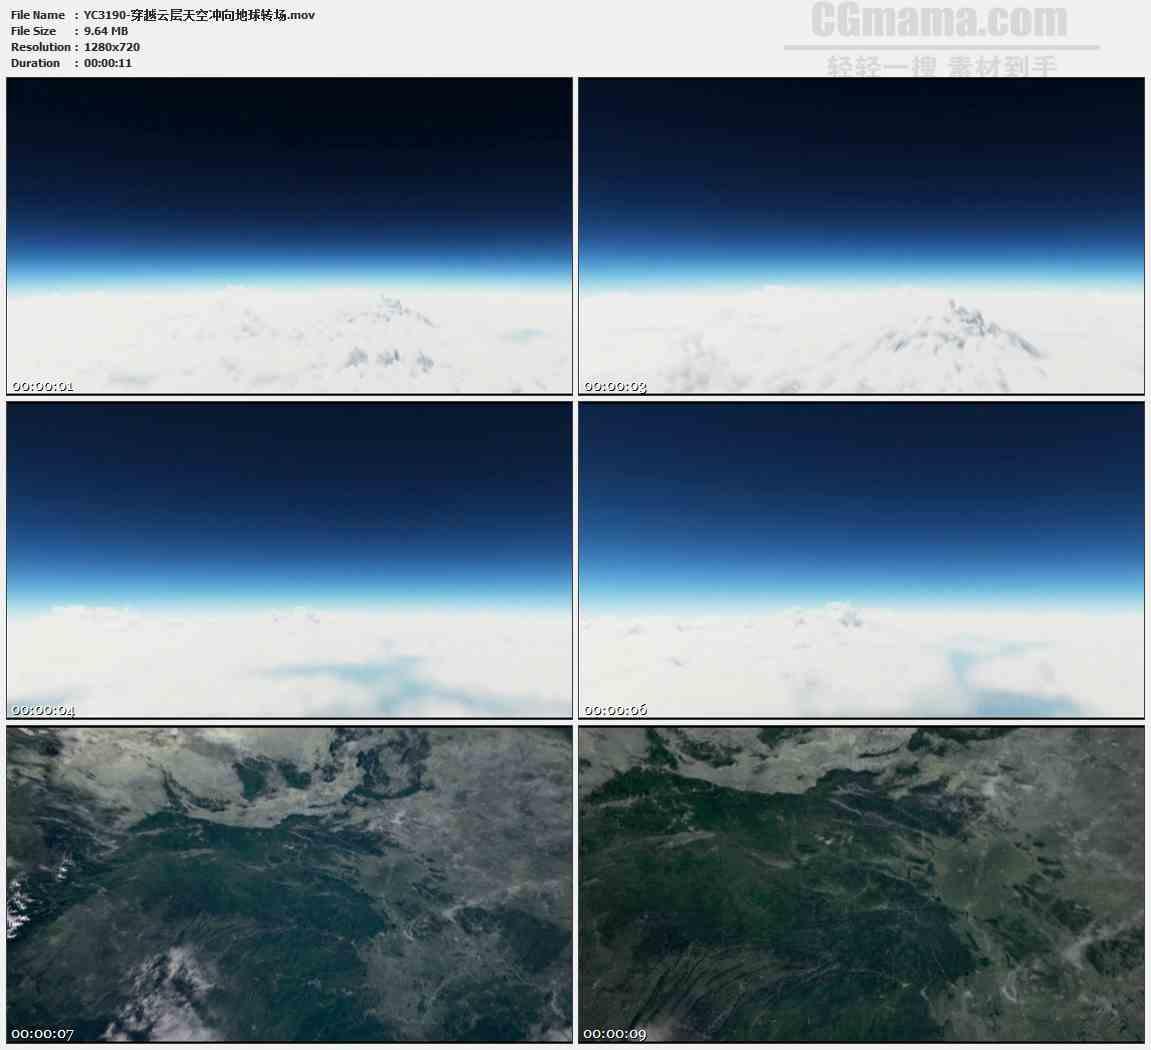 YC3190-穿越云层天空冲向地球转场高清实拍视频素材